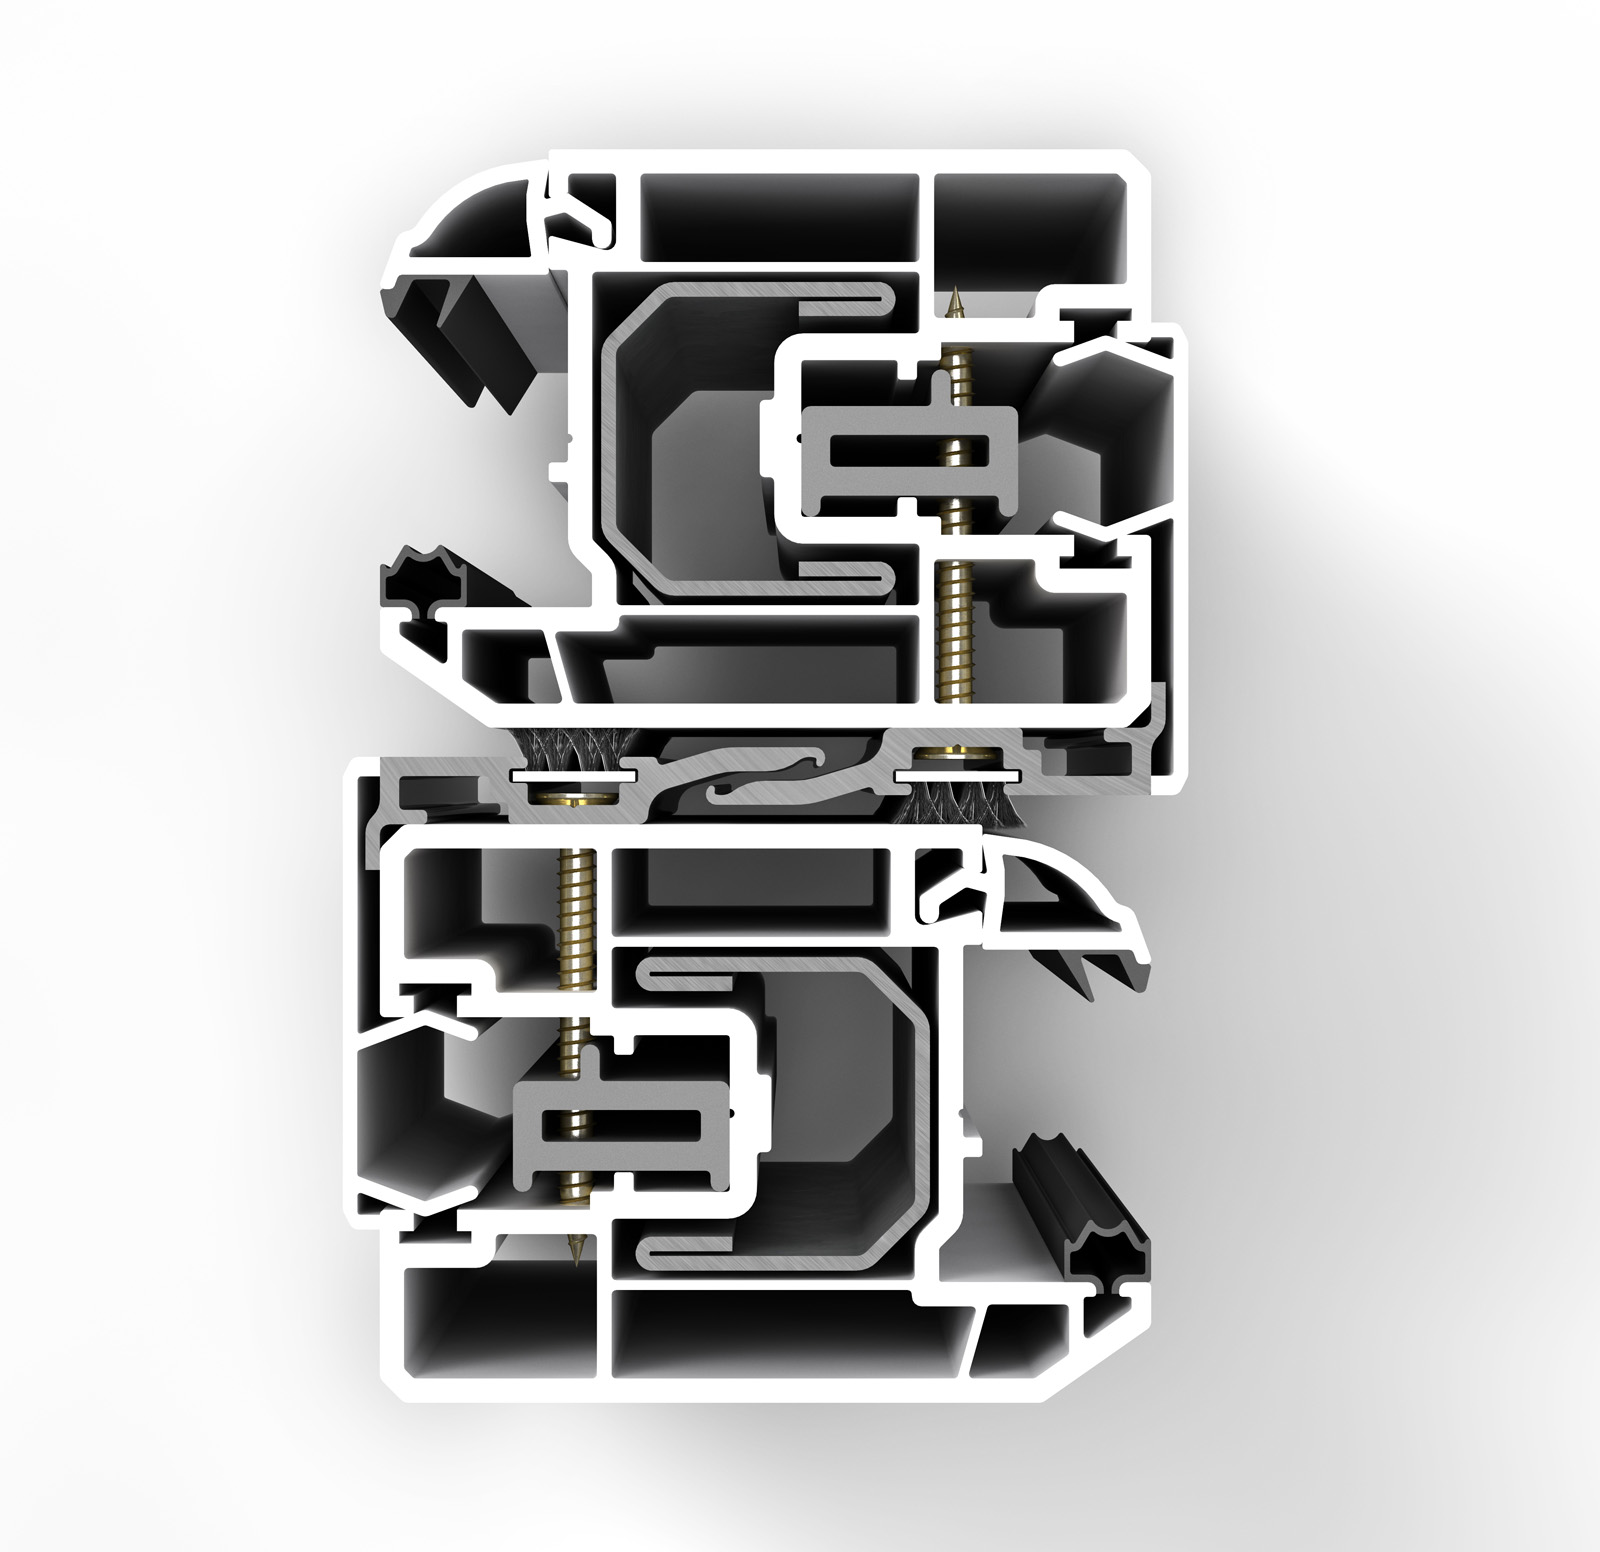 Patiomaster PVCu 2